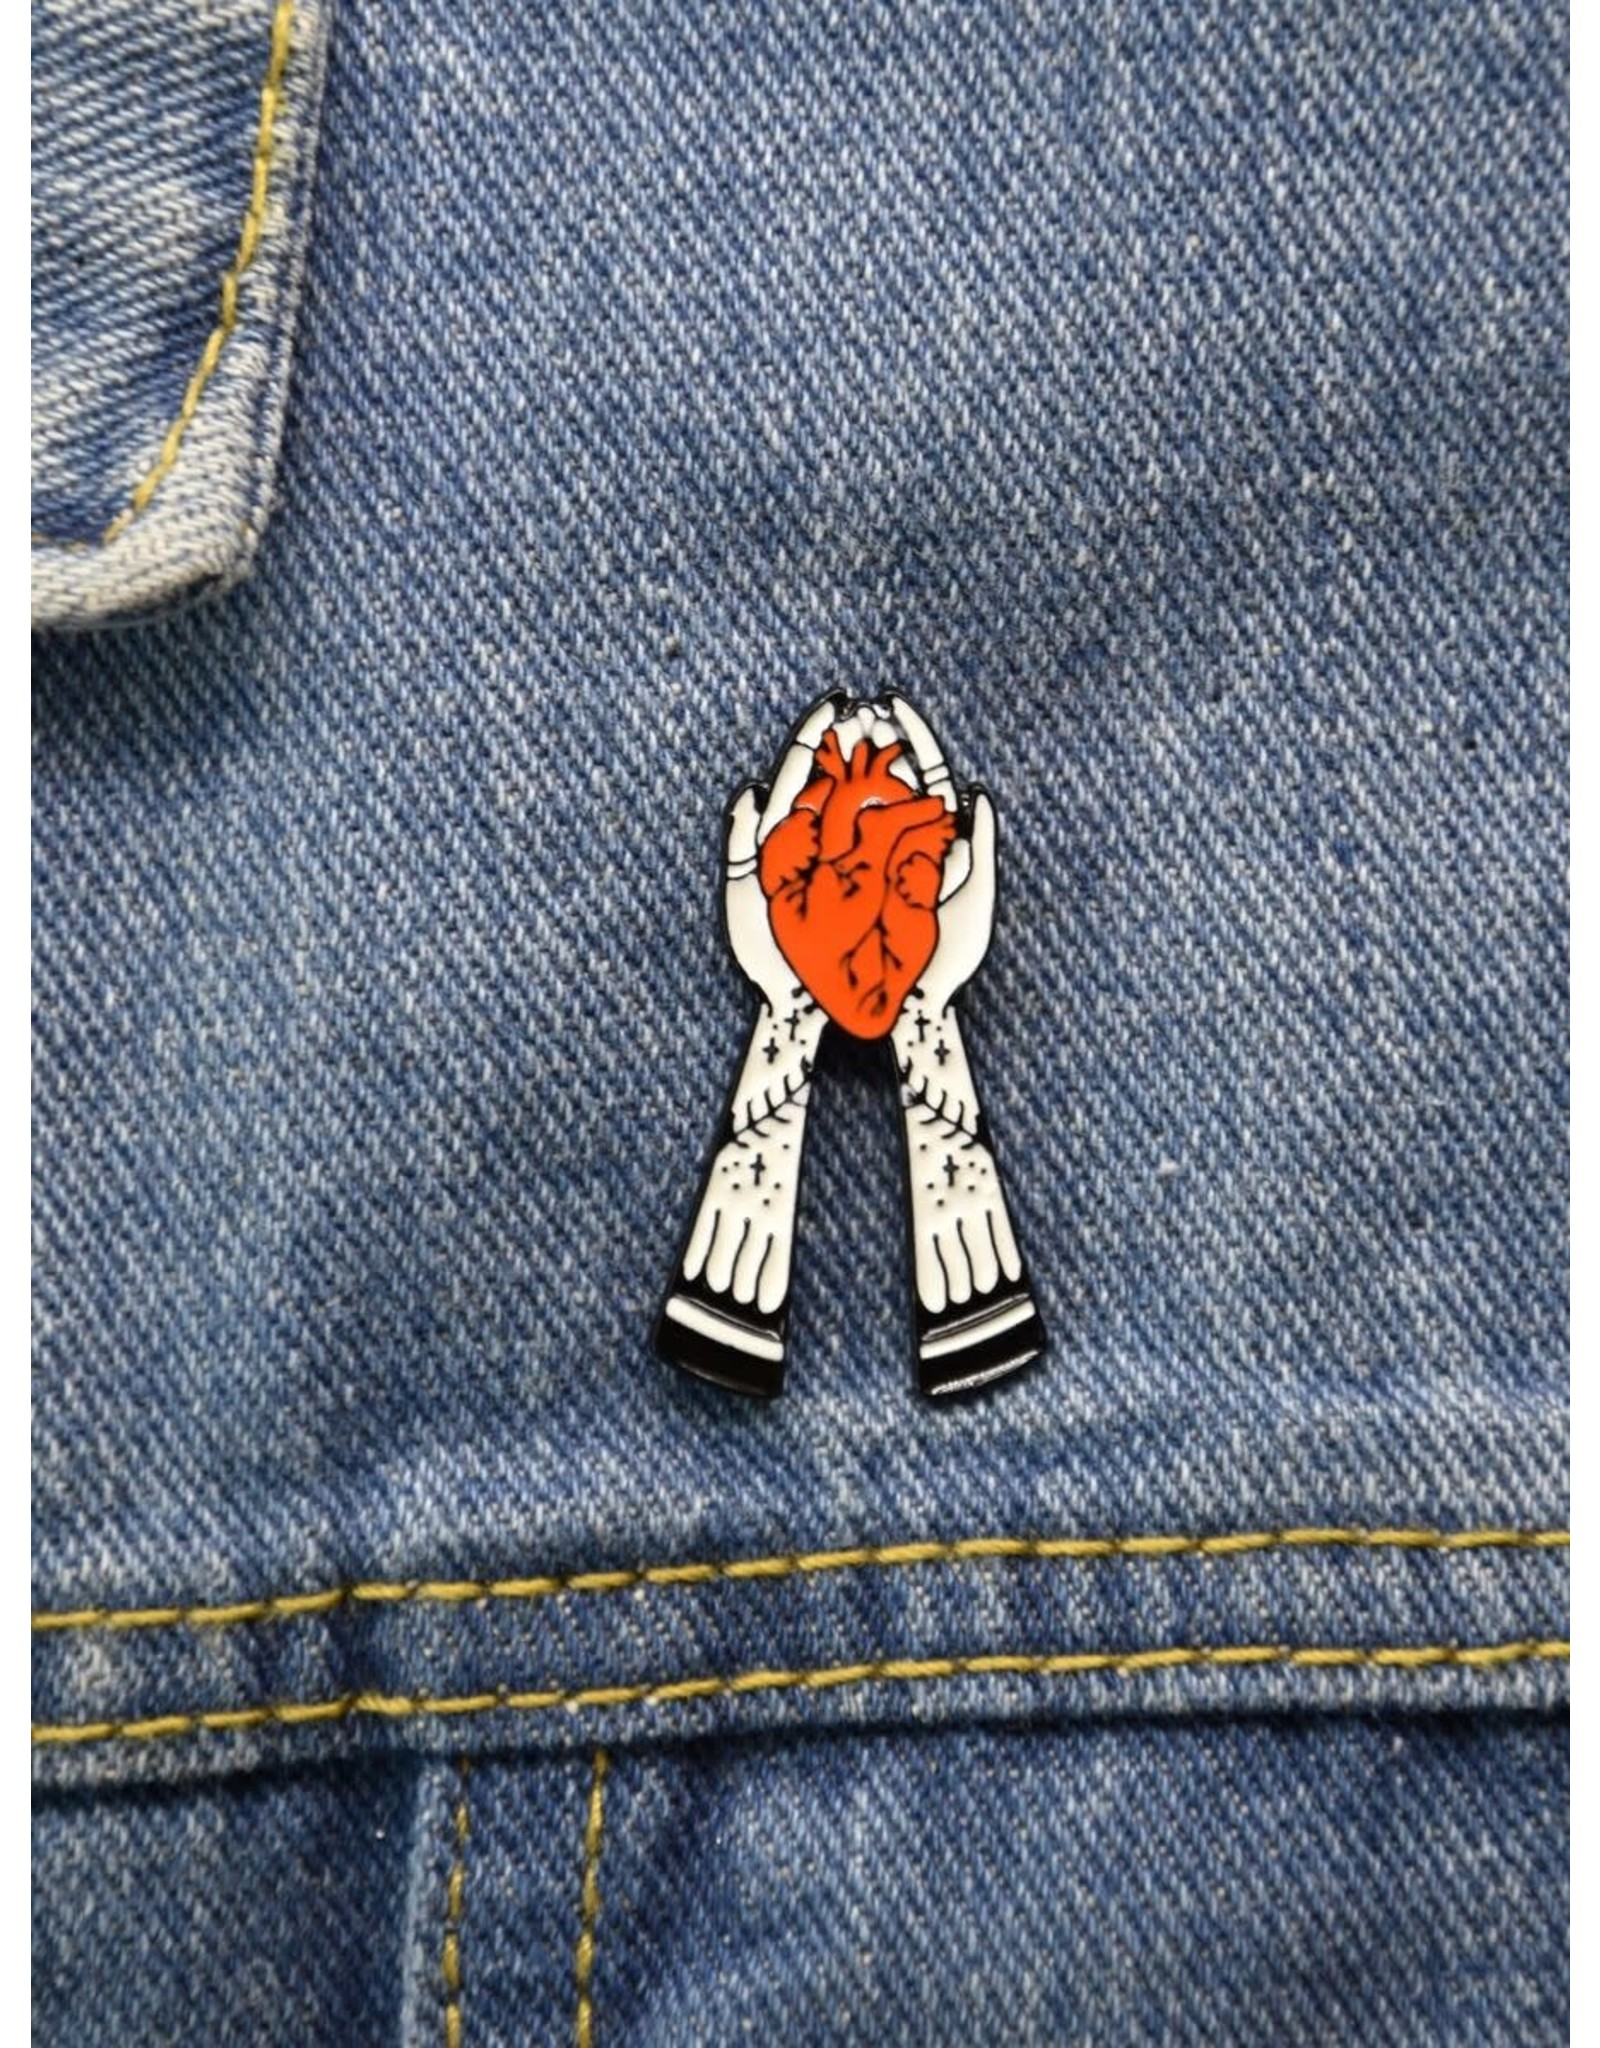 Shein Pin - Heart In Hands